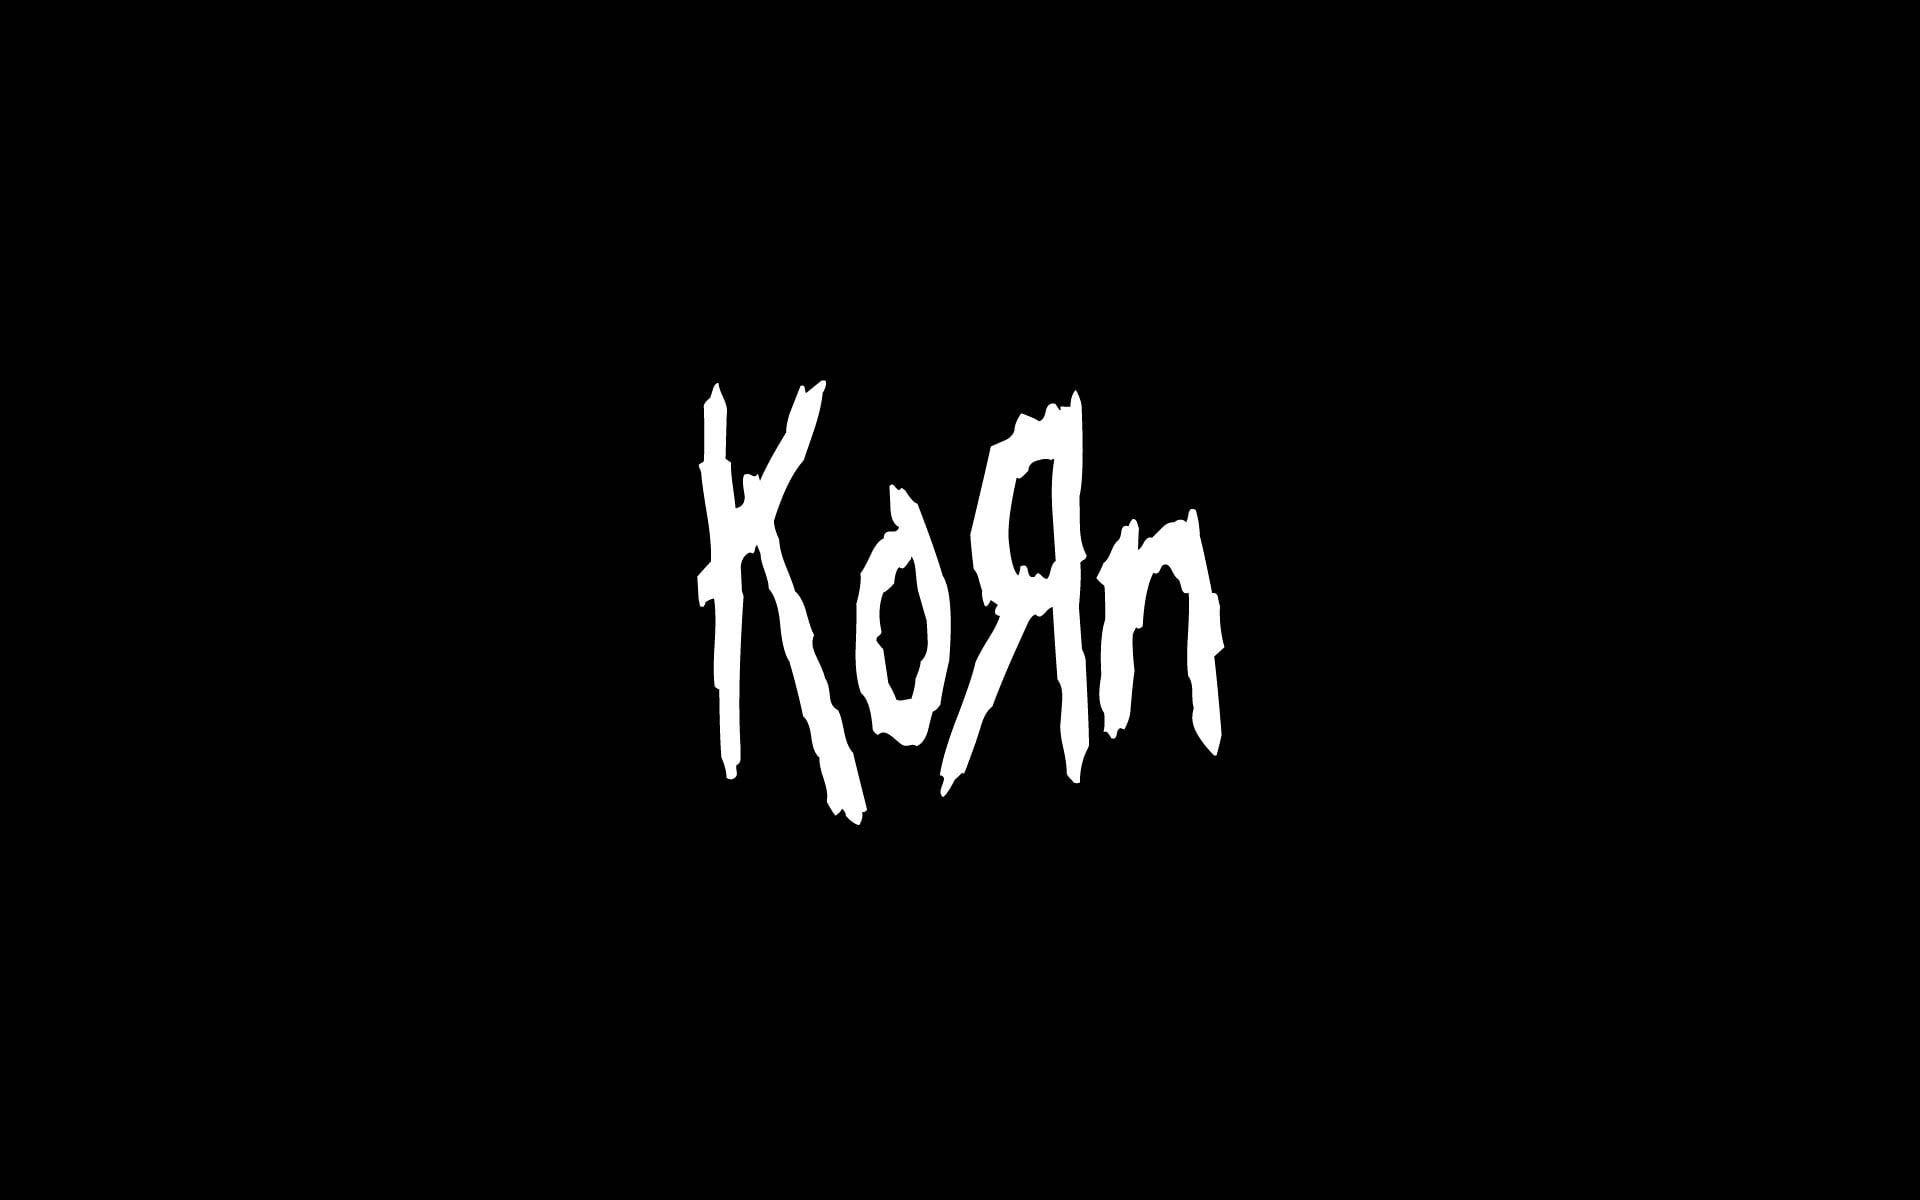 Korn Bw Black Hd Black Music Bw Korn 1080p Wallpaper Hdwallpaper Desktop Korn Music Music Wallpaper